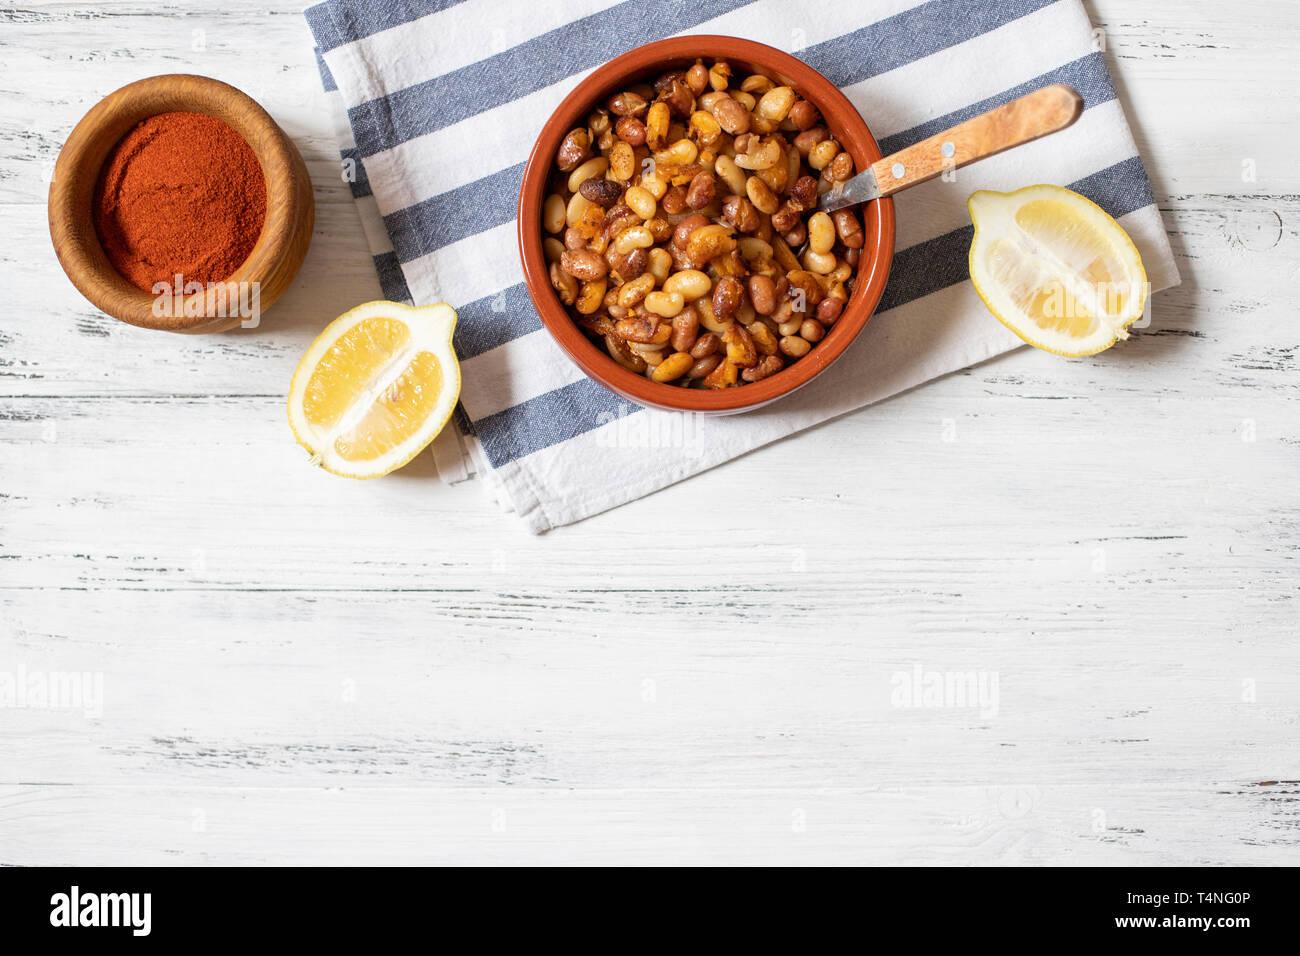 Prebranac. Balkan baked beans. Serbian, Montenegrin, Bosnian, Croatian, Slovenian cuisine. Uncooked beans, onion, lemon, paprika powder. White wooden Stock Photo